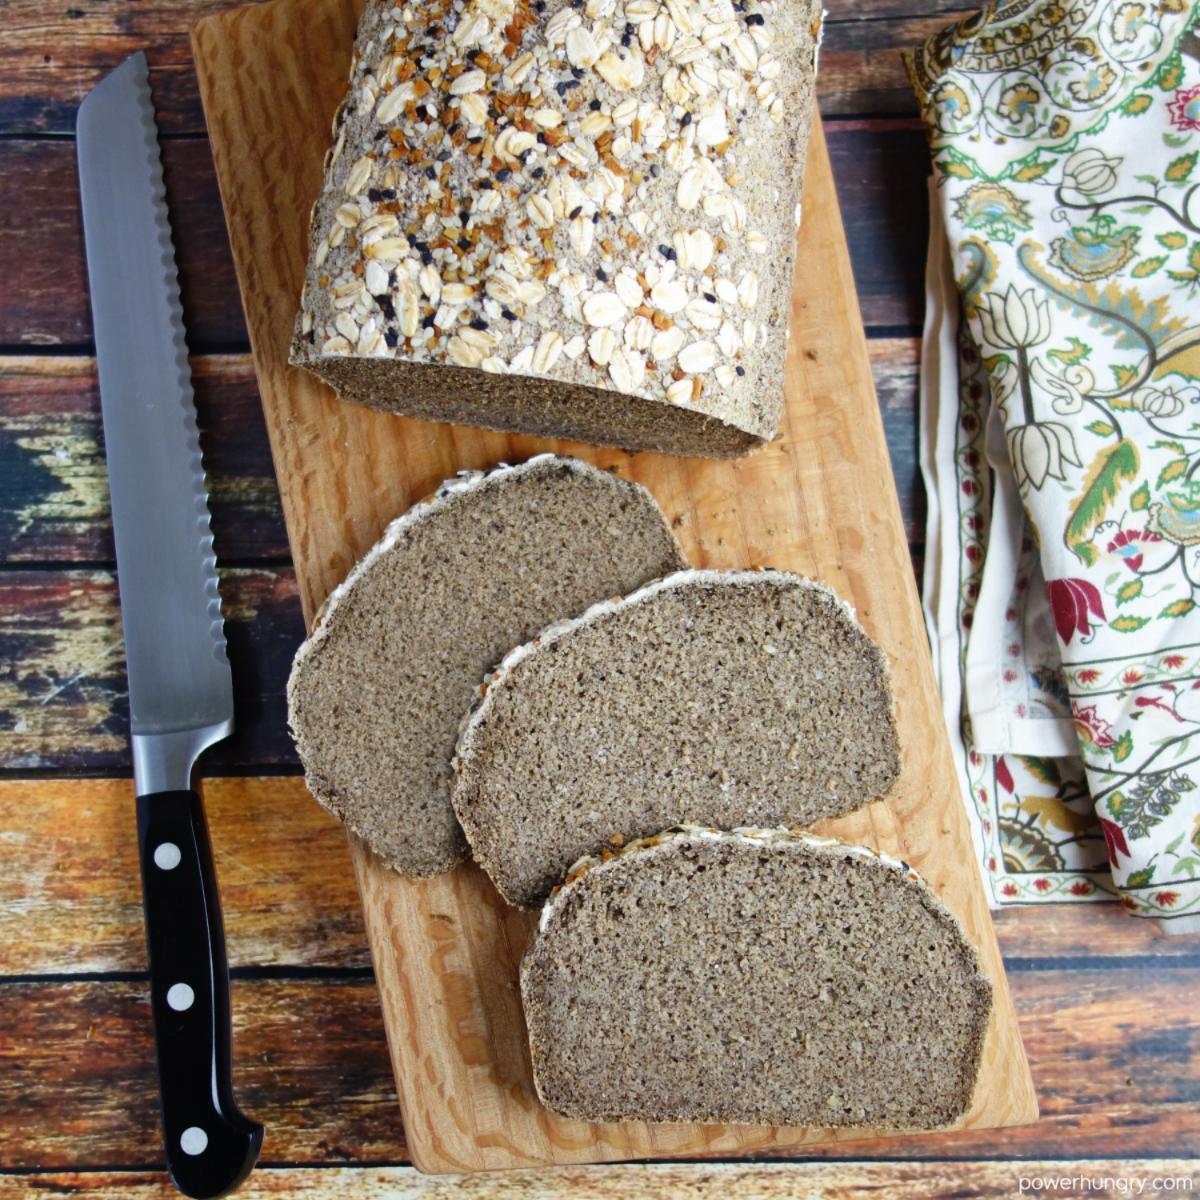 a sliced loaf of gluten-free bluckwheat bread on an artisan wood cutting board.